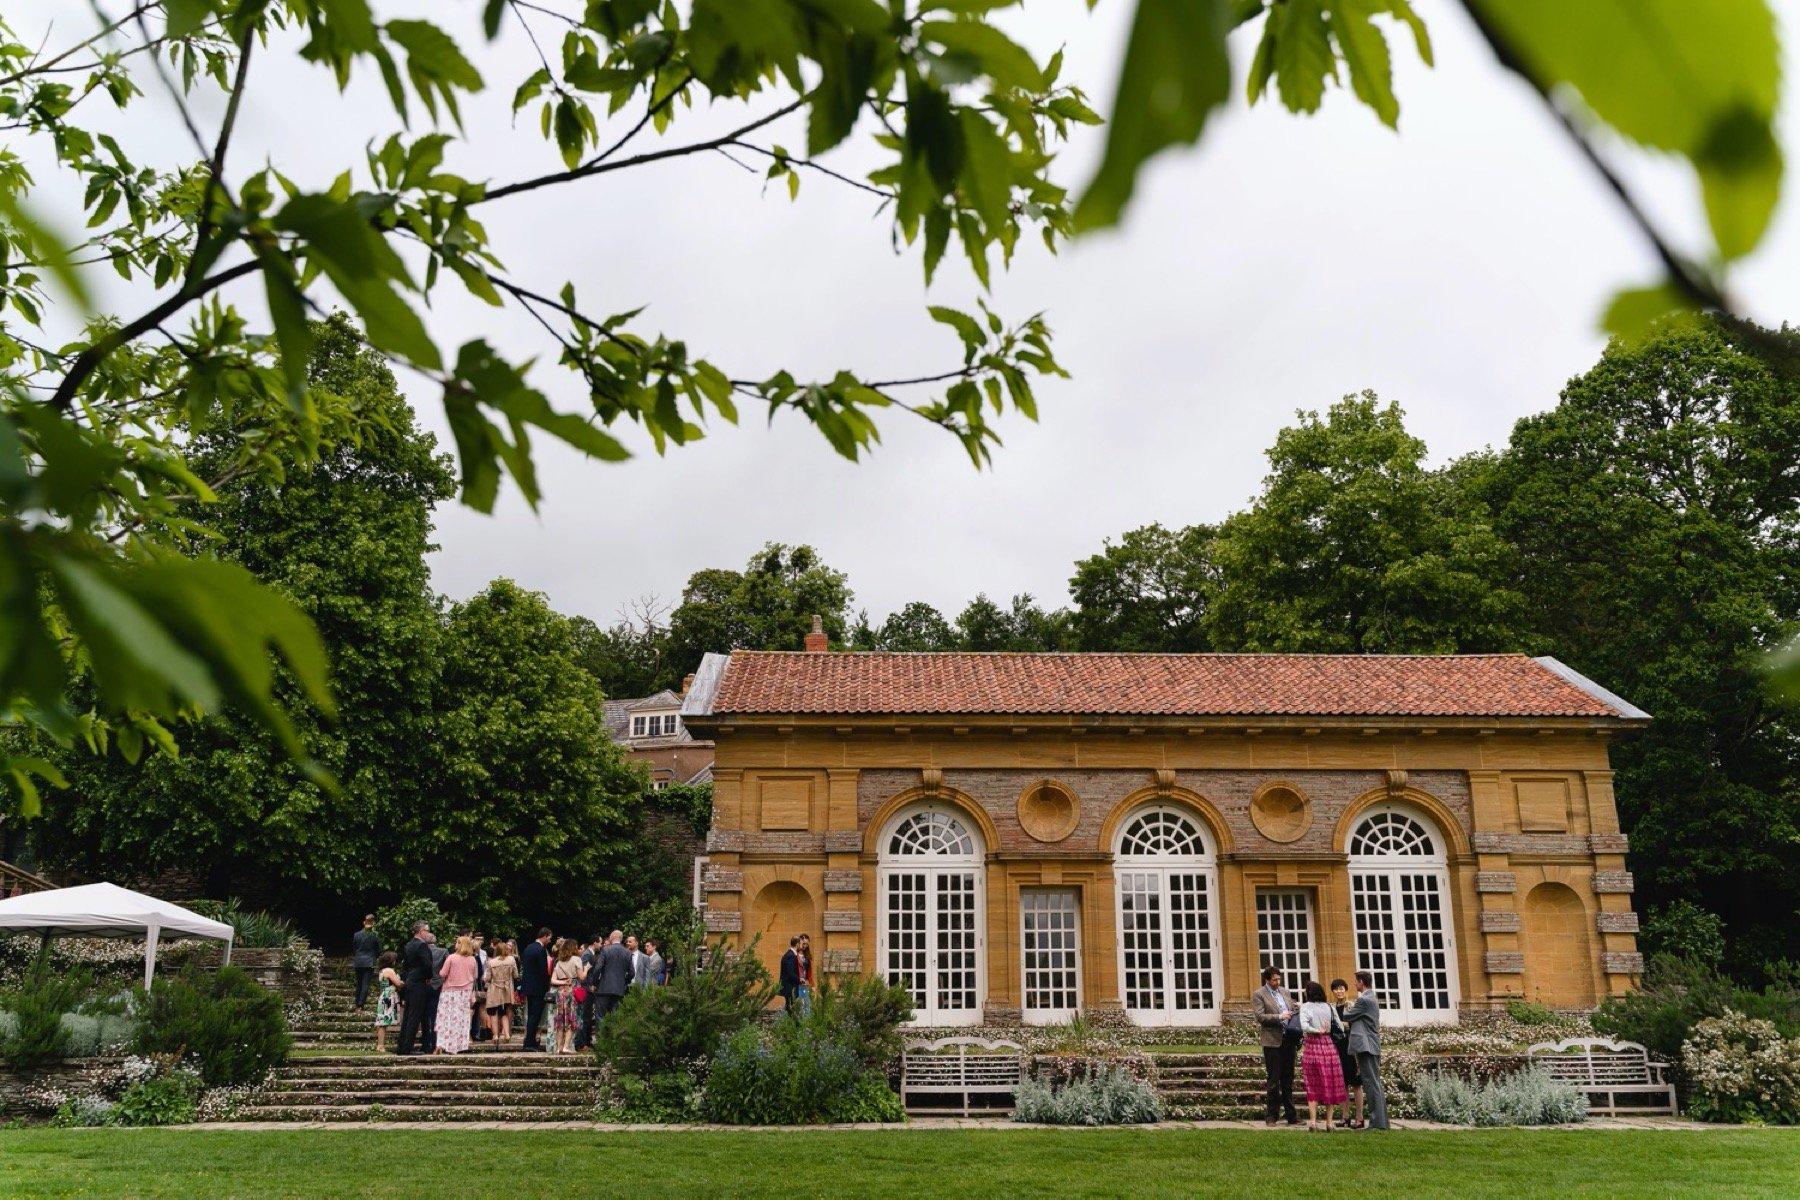 hestercombe gardens orangery